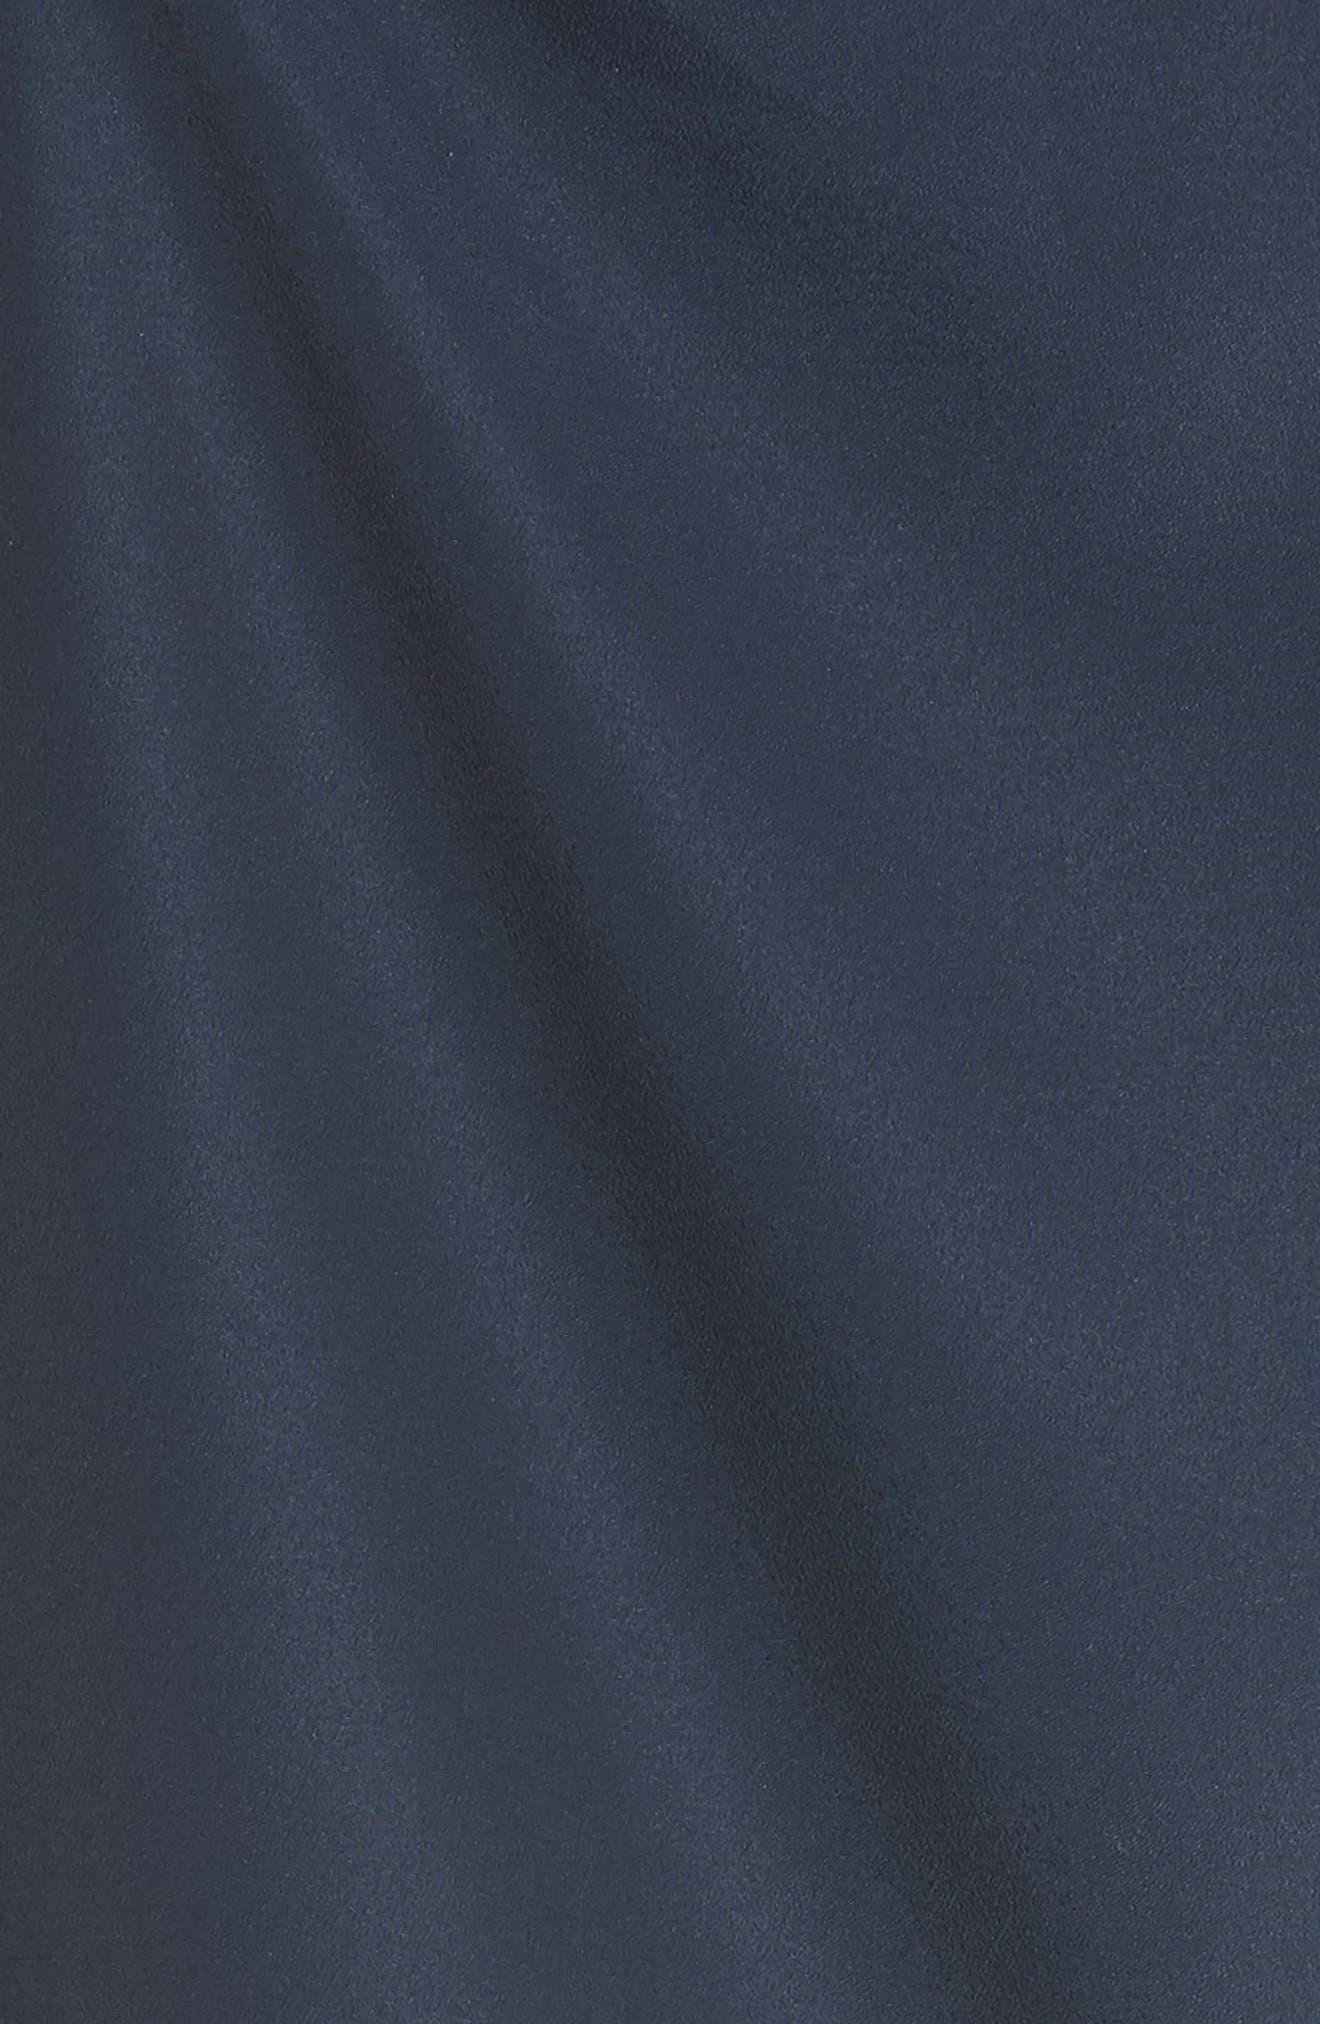 Edyte Asymmetrical Dress,                             Alternate thumbnail 5, color,                             418